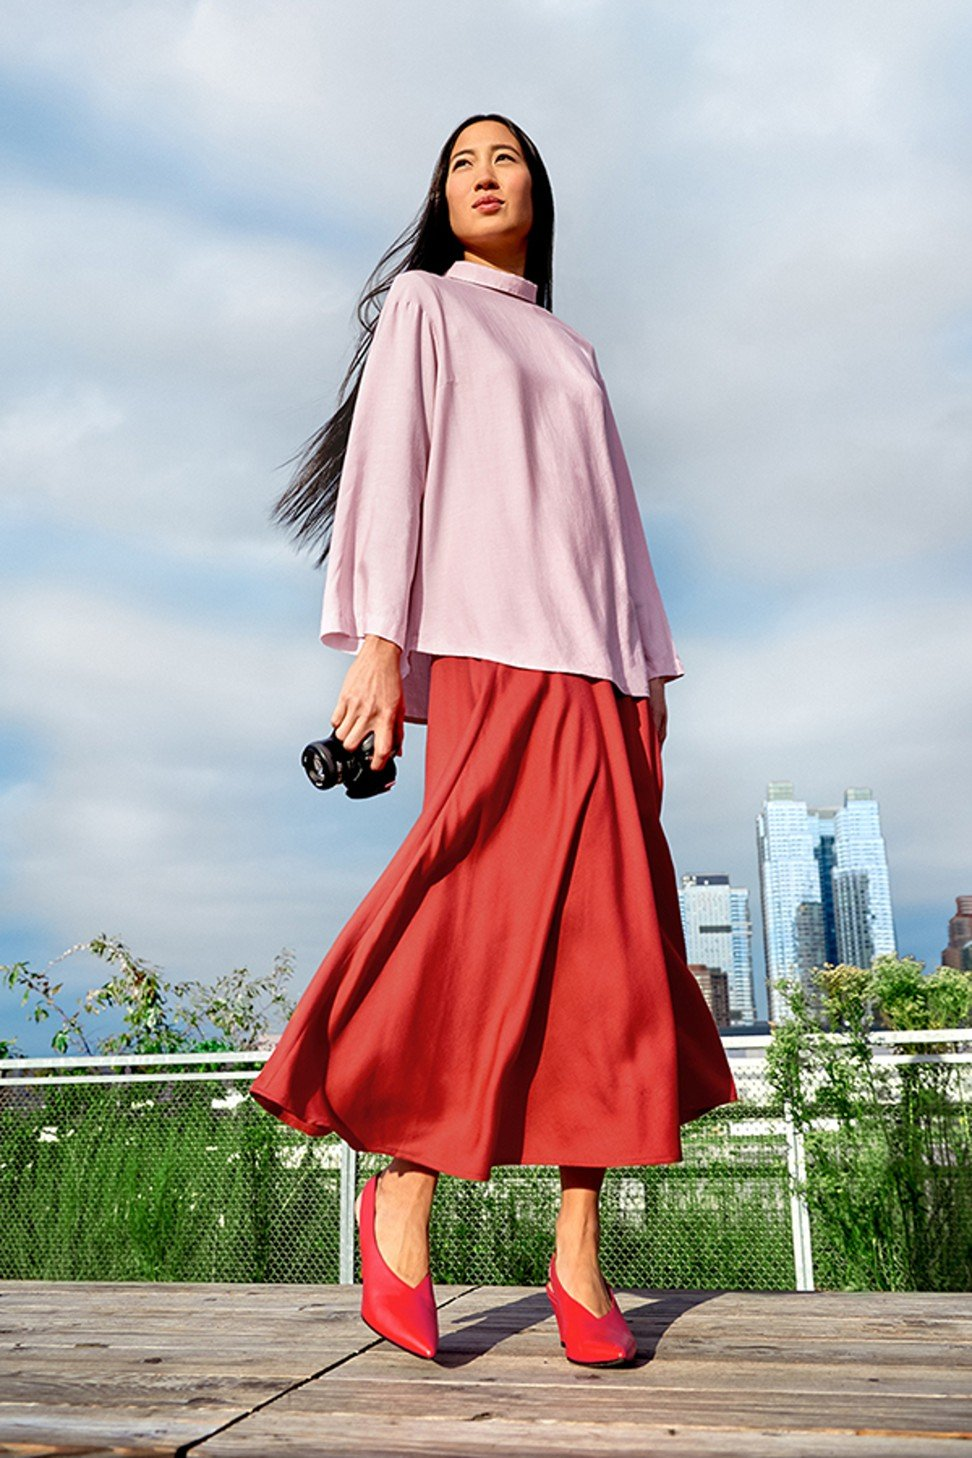 A look from British-Japanese Muslim fashion designer Hana Tajima's spring/summer 2018 collection for Uniqlo.